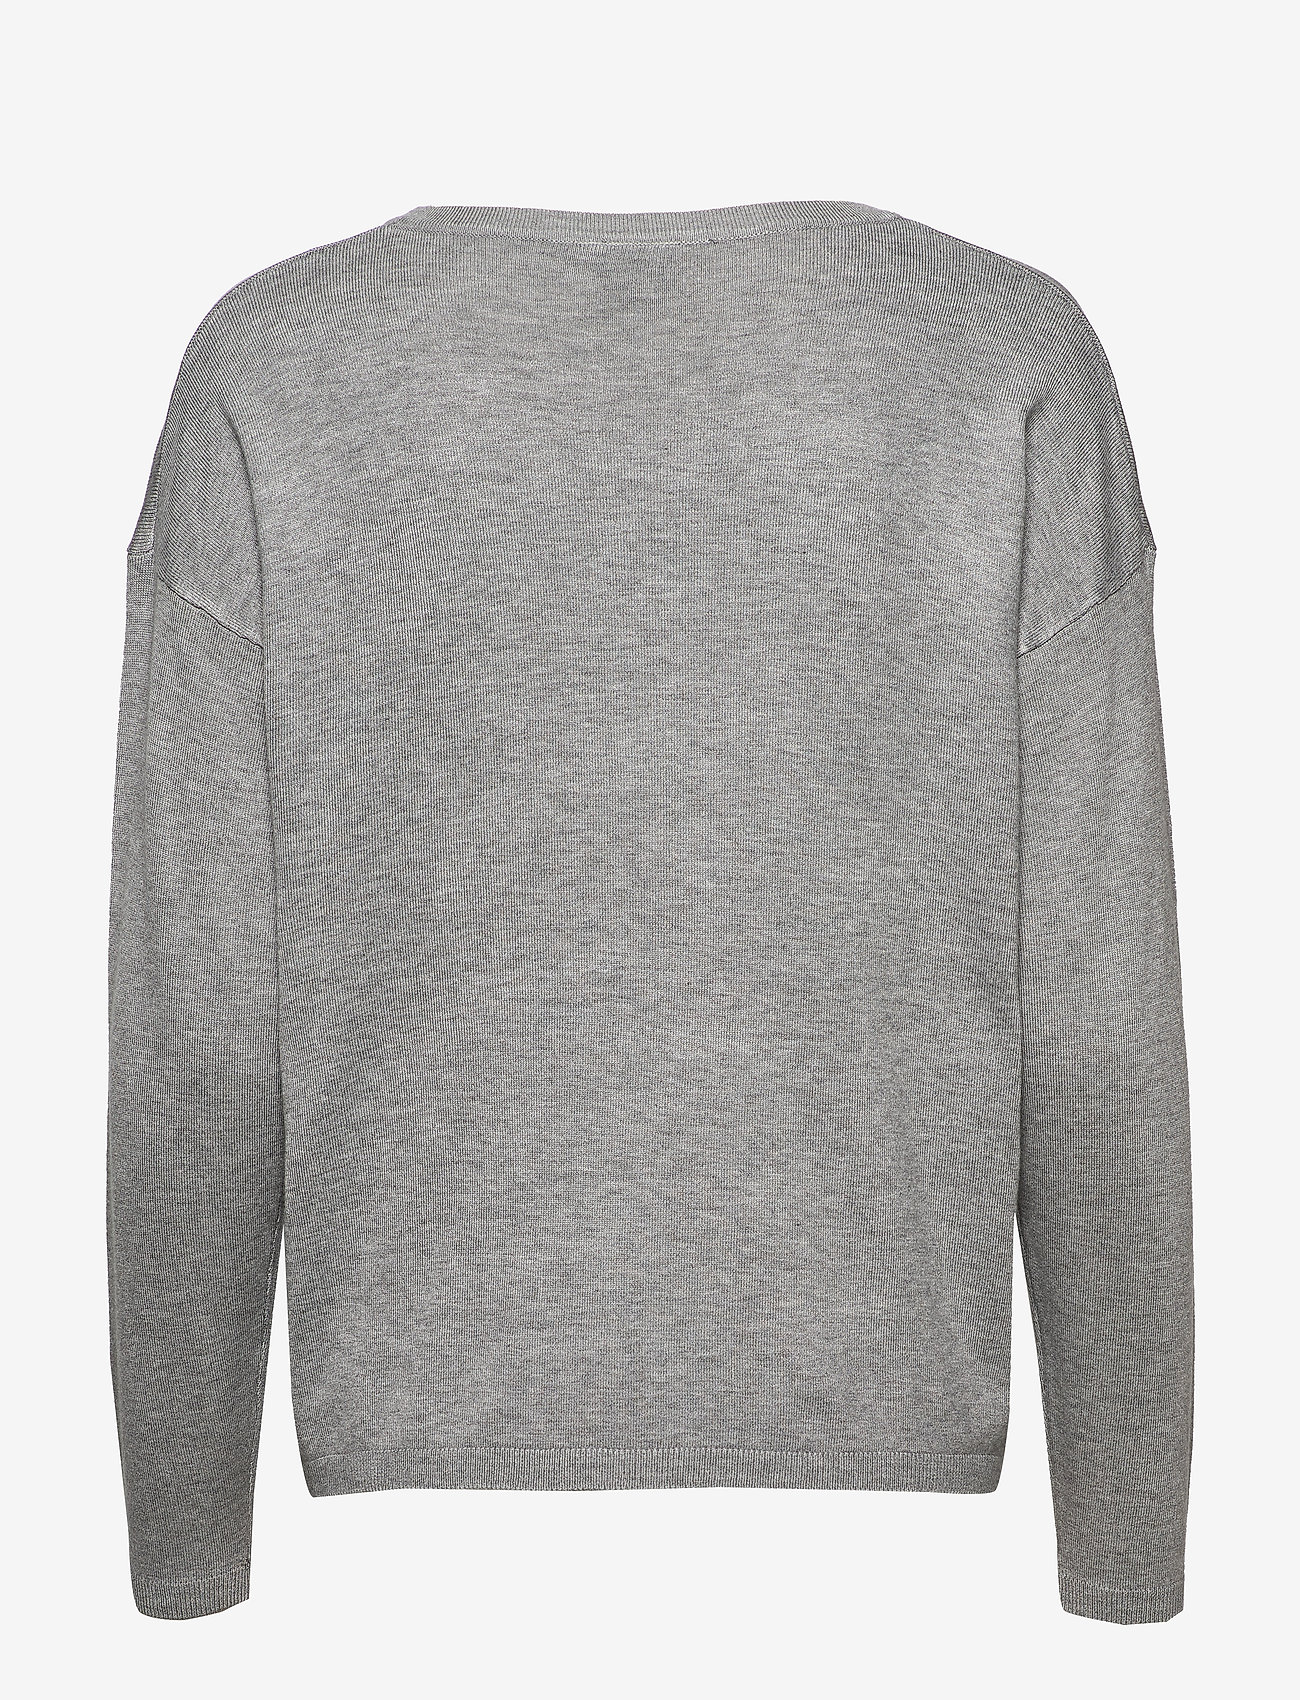 ICHI - IHMAFA V LS2 - jumpers - grey melange - 1